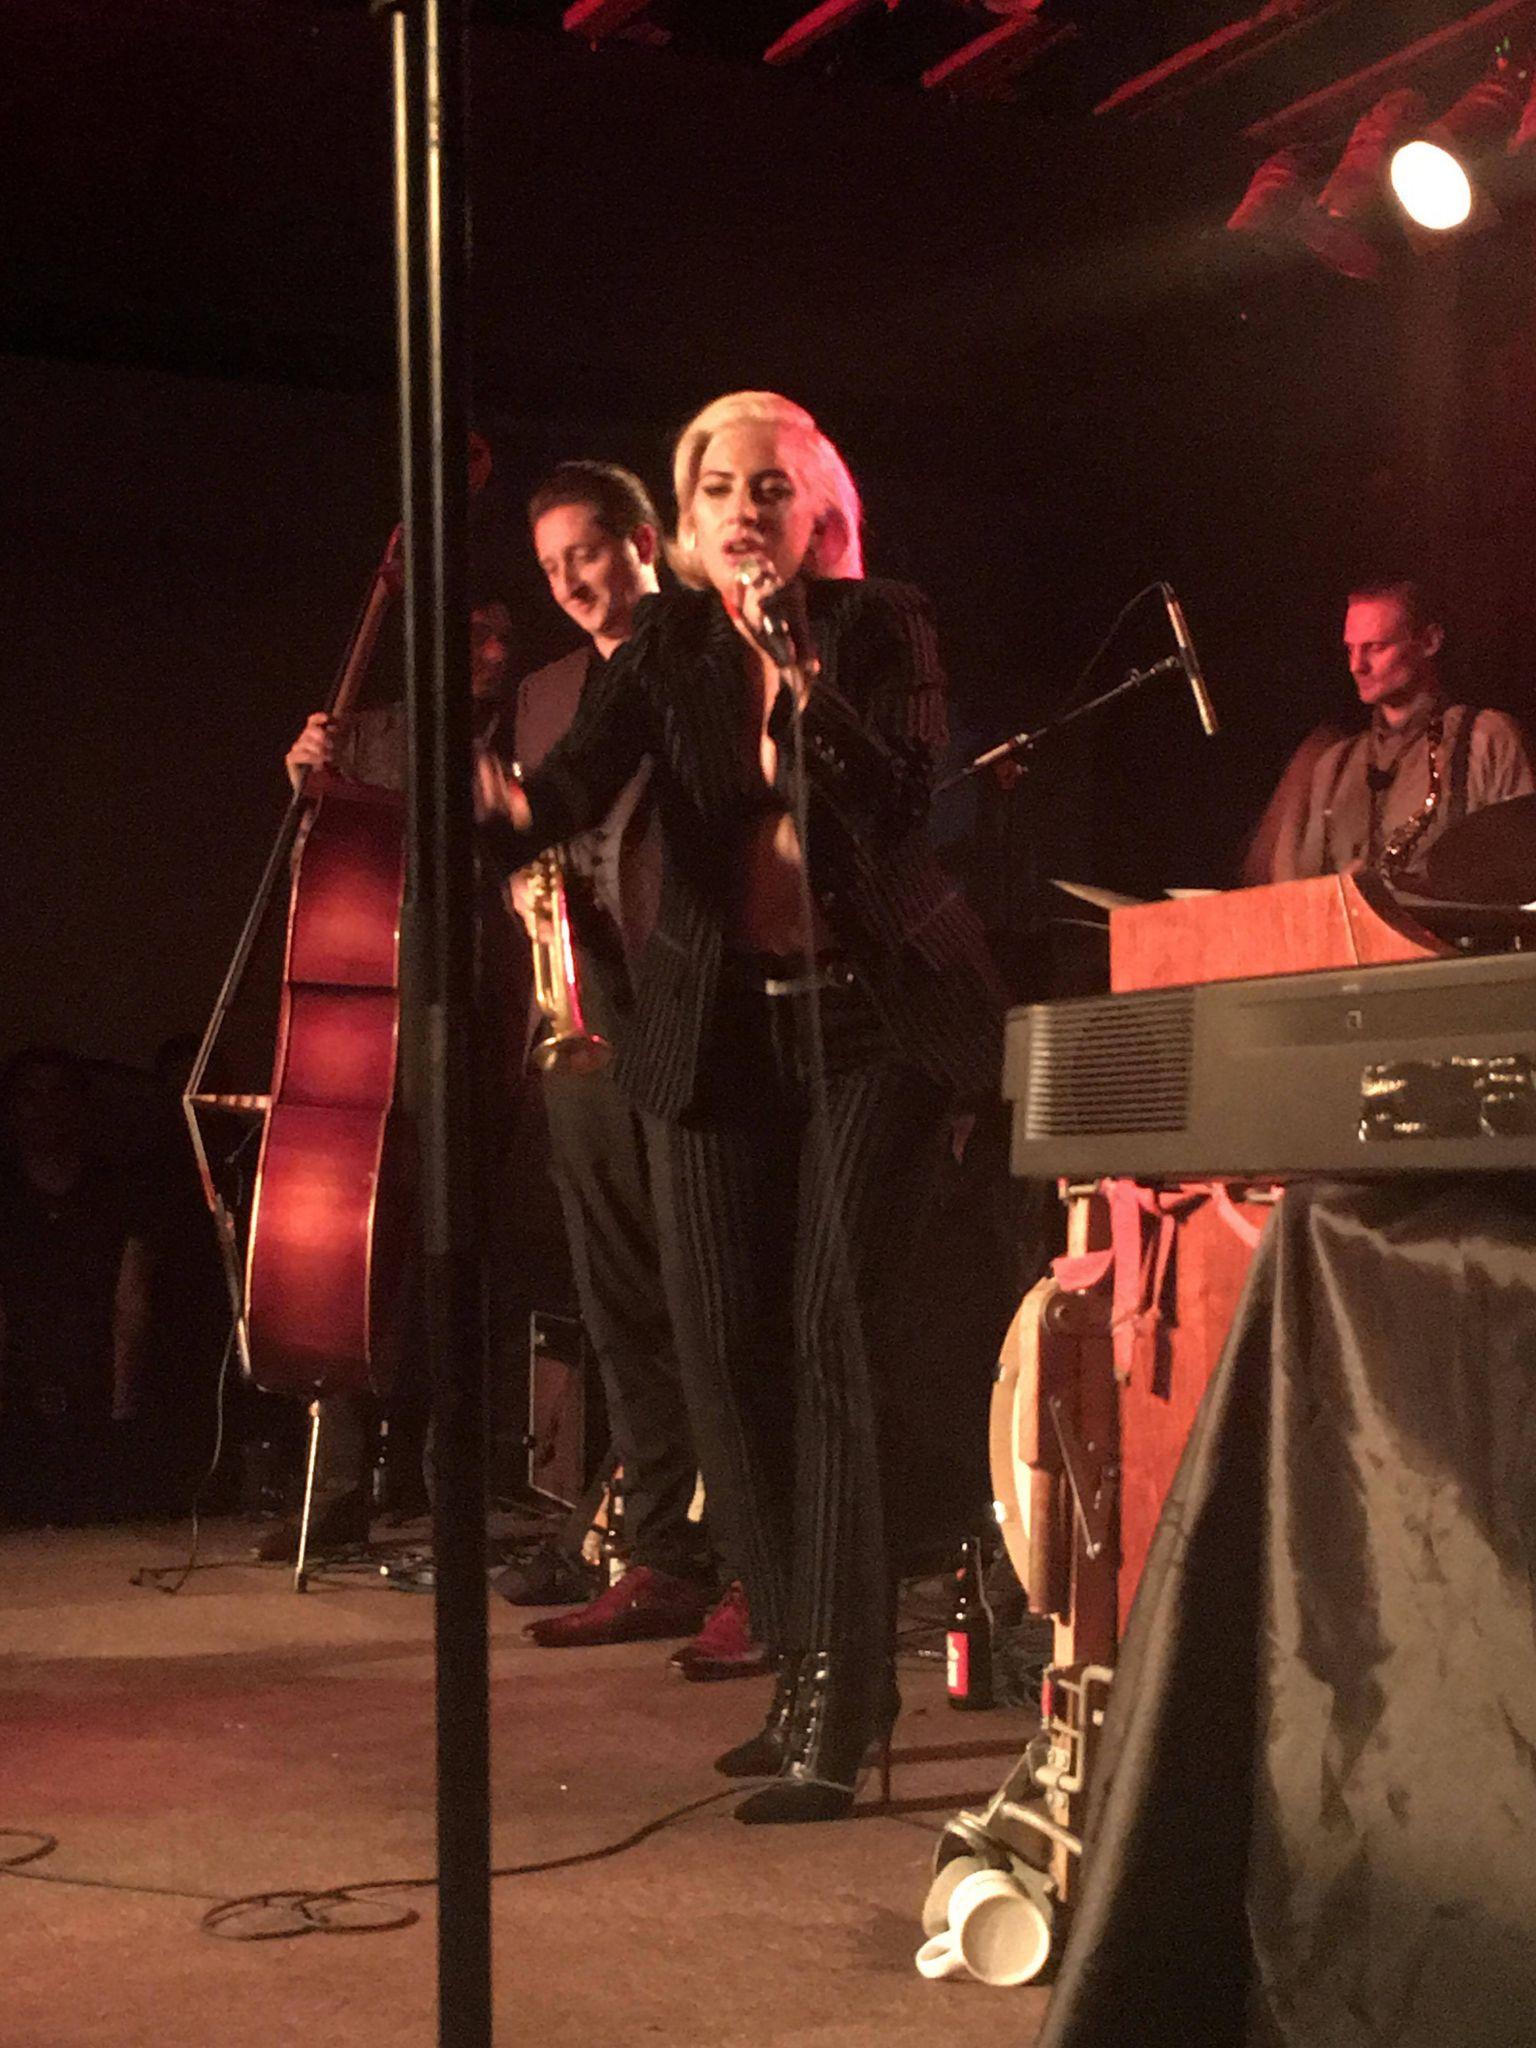 Sneak peek: See into Lady Gaga's surprise, intimate performance at Antone's Nightclub in Austin